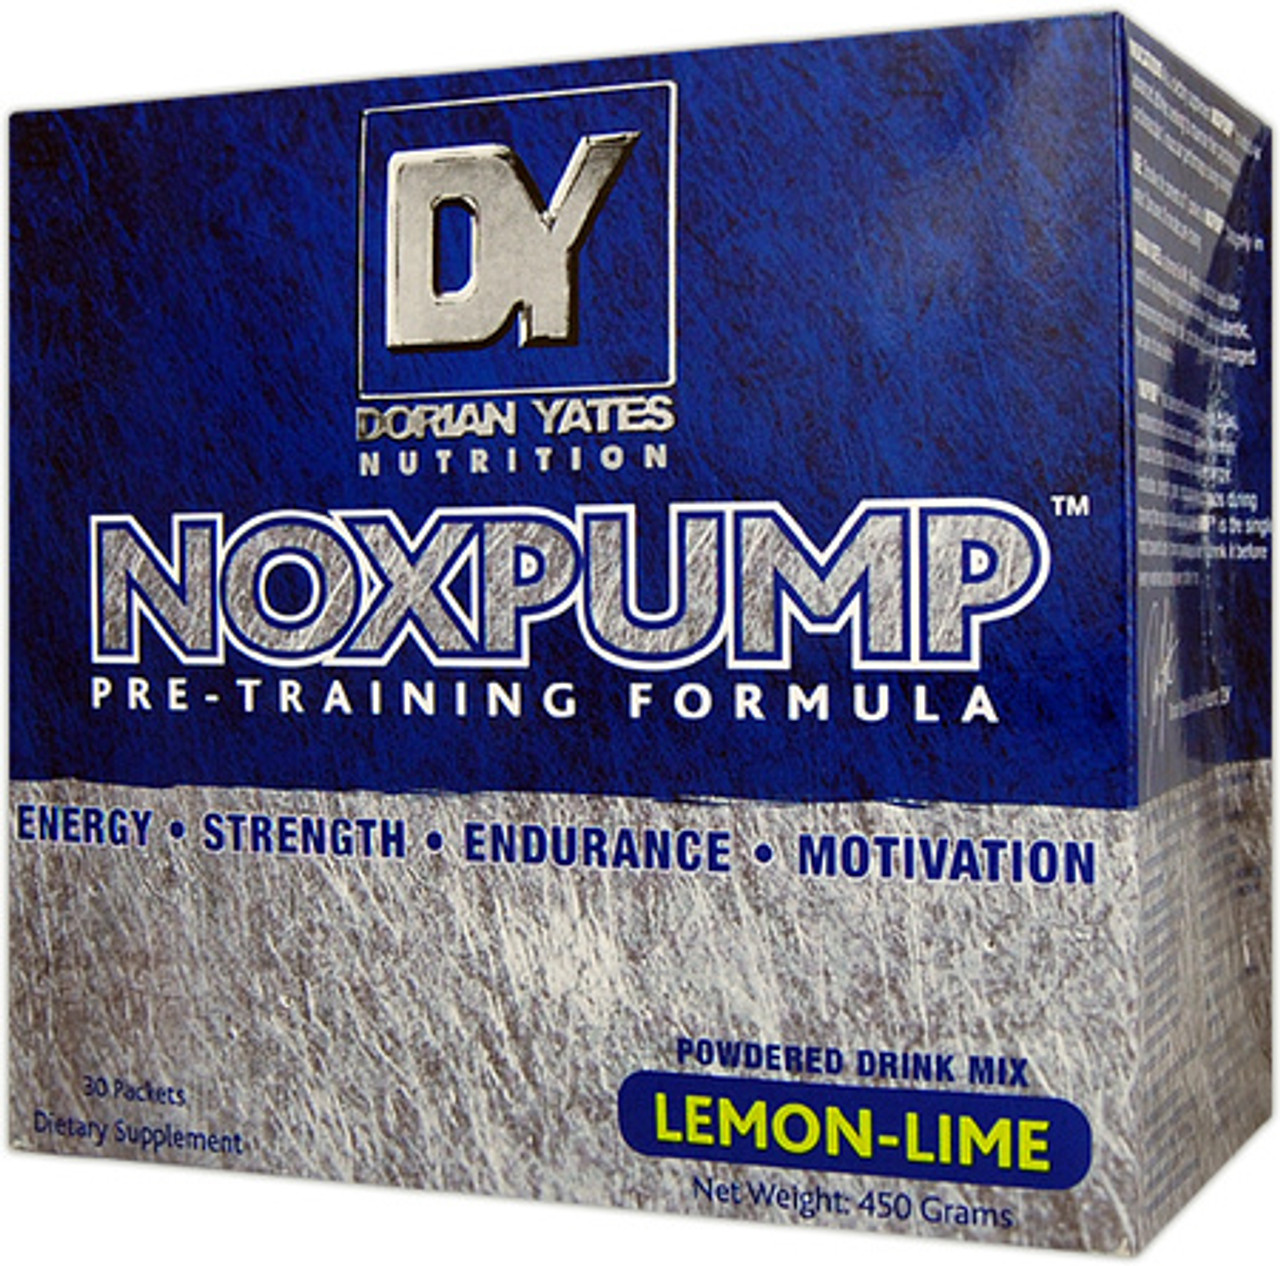 Noxpump 30pk Dorian Yates Nutrition I Supplements